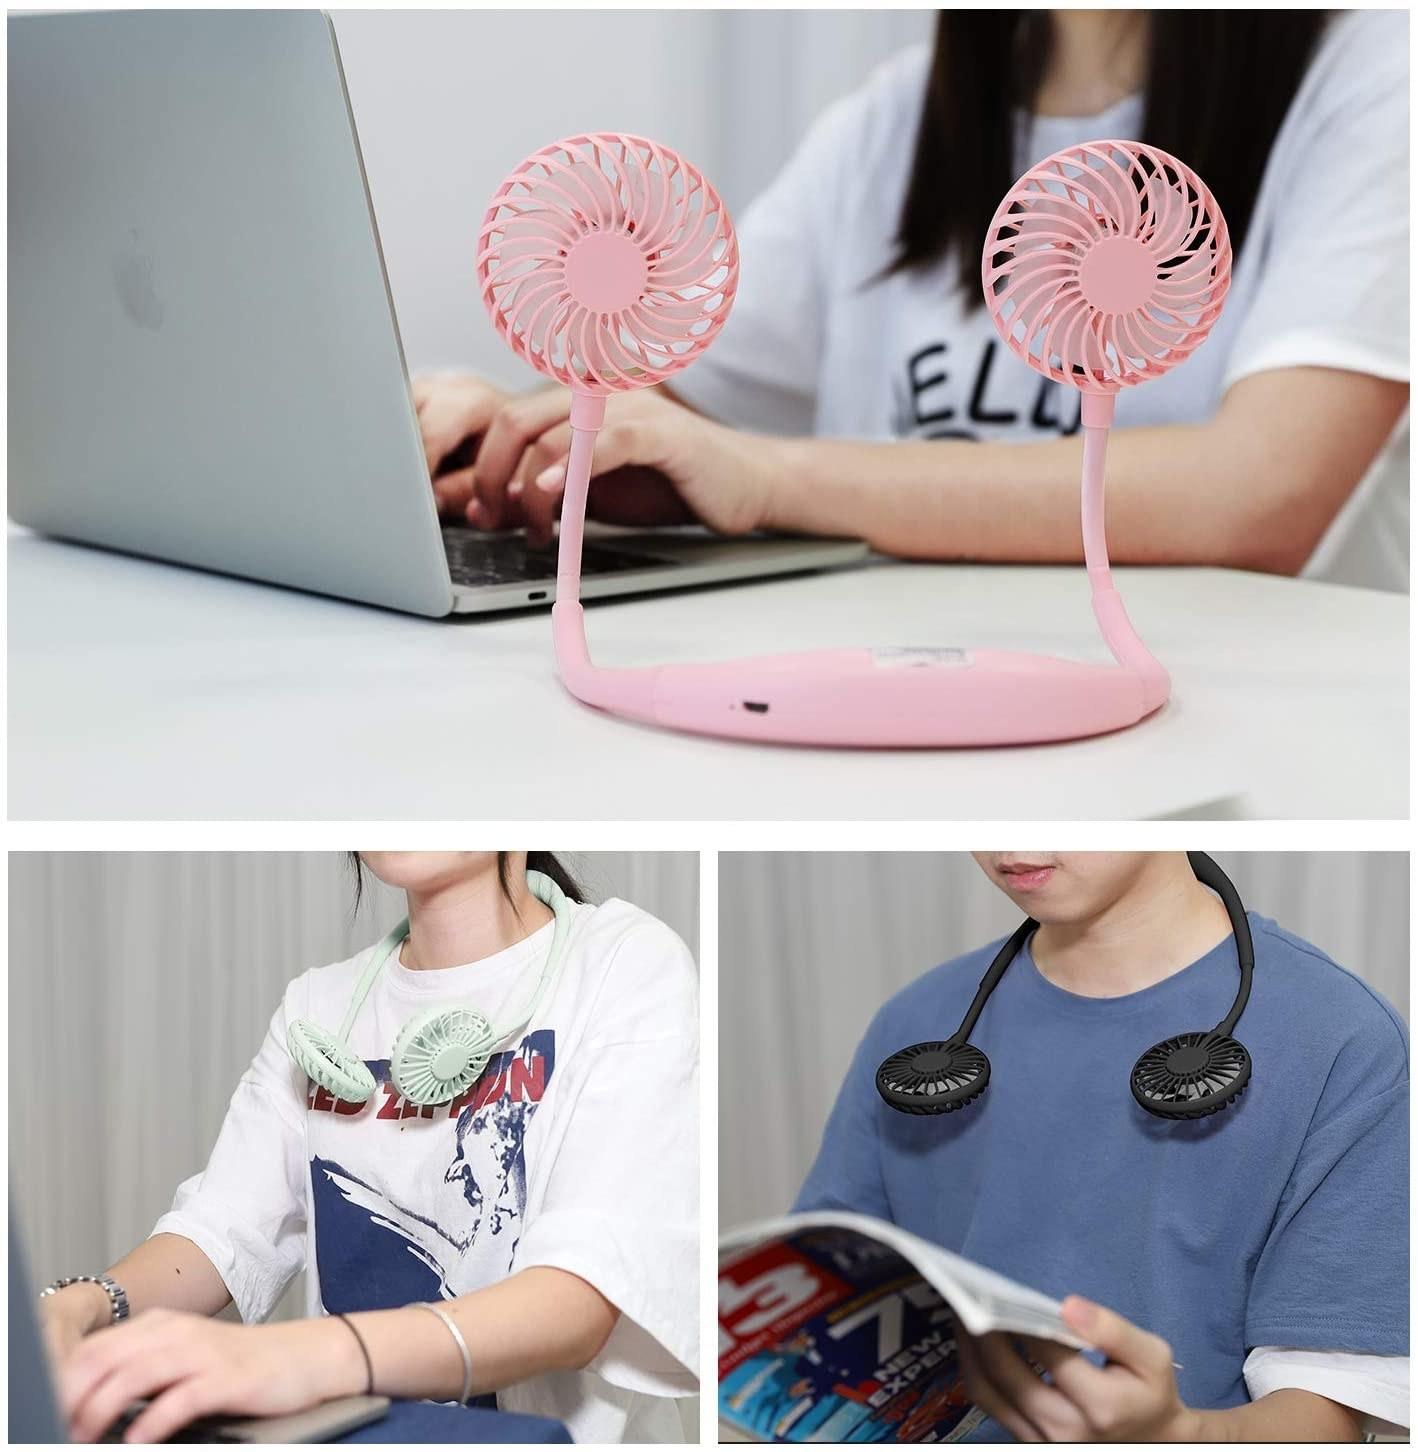 Two people wearing fans and one fan on a desk